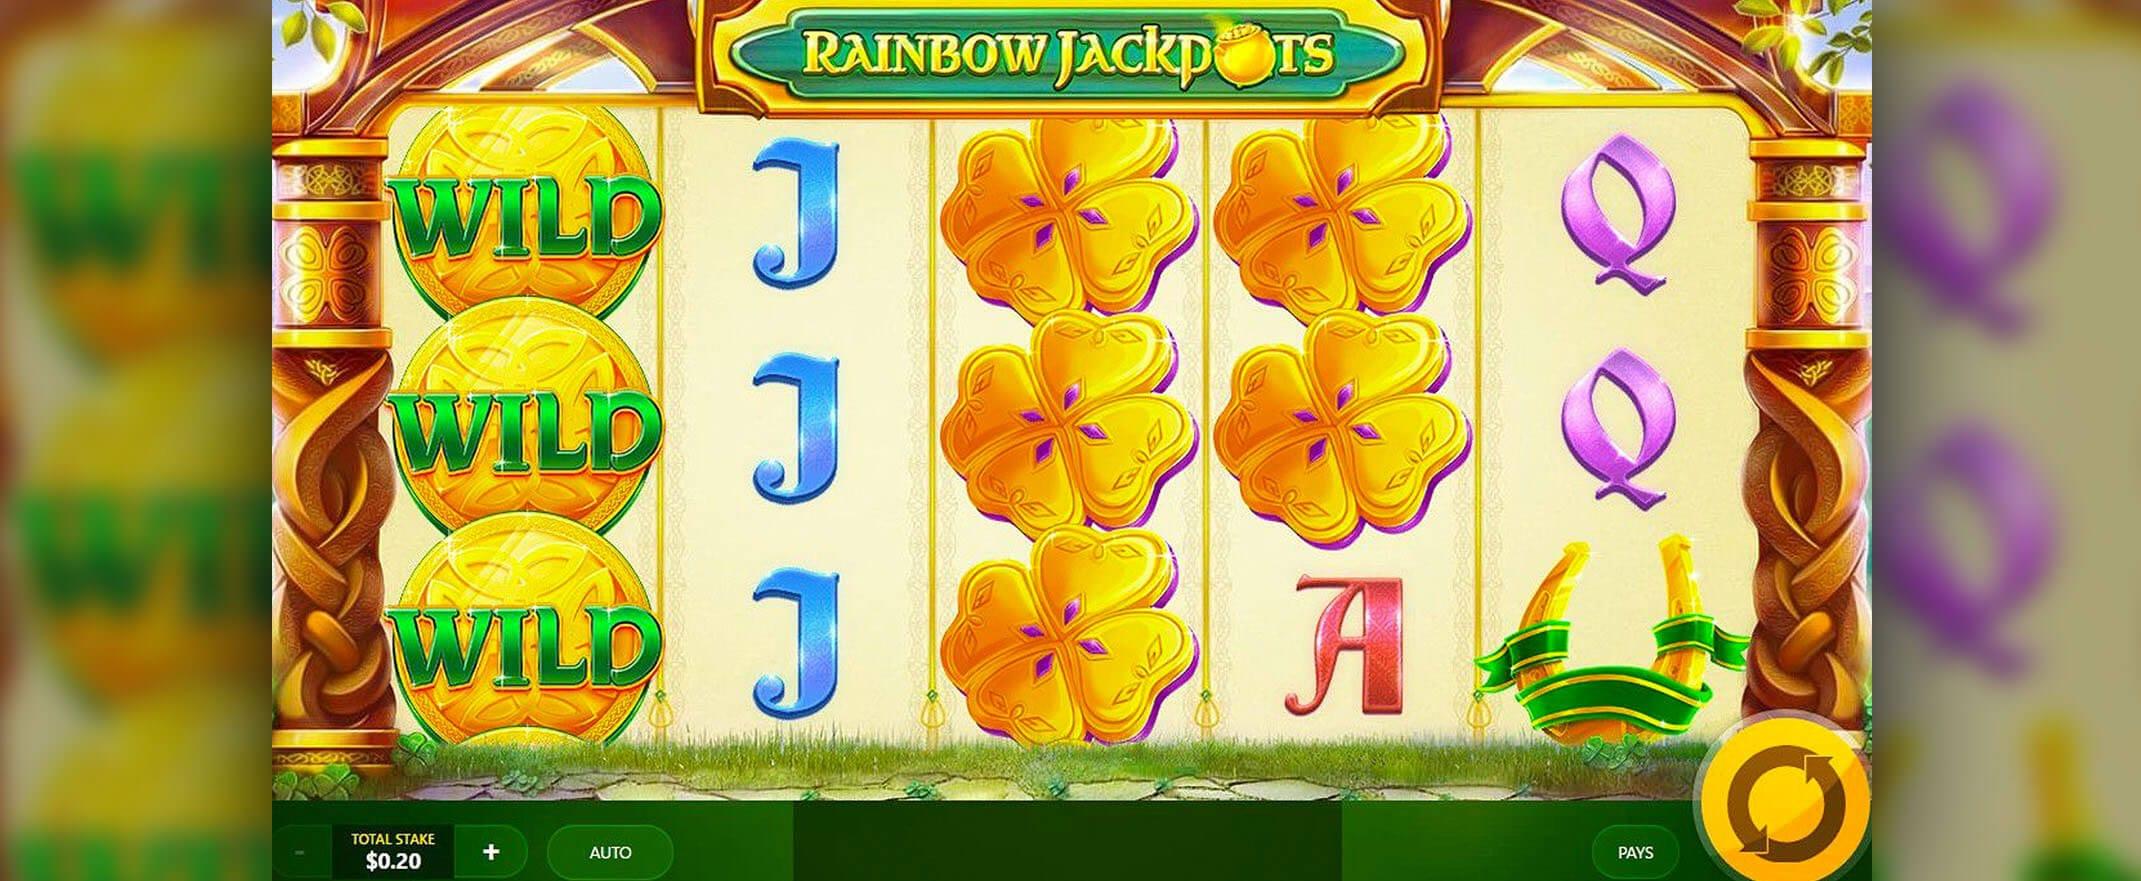 Rainbow Jackpots Casino Game